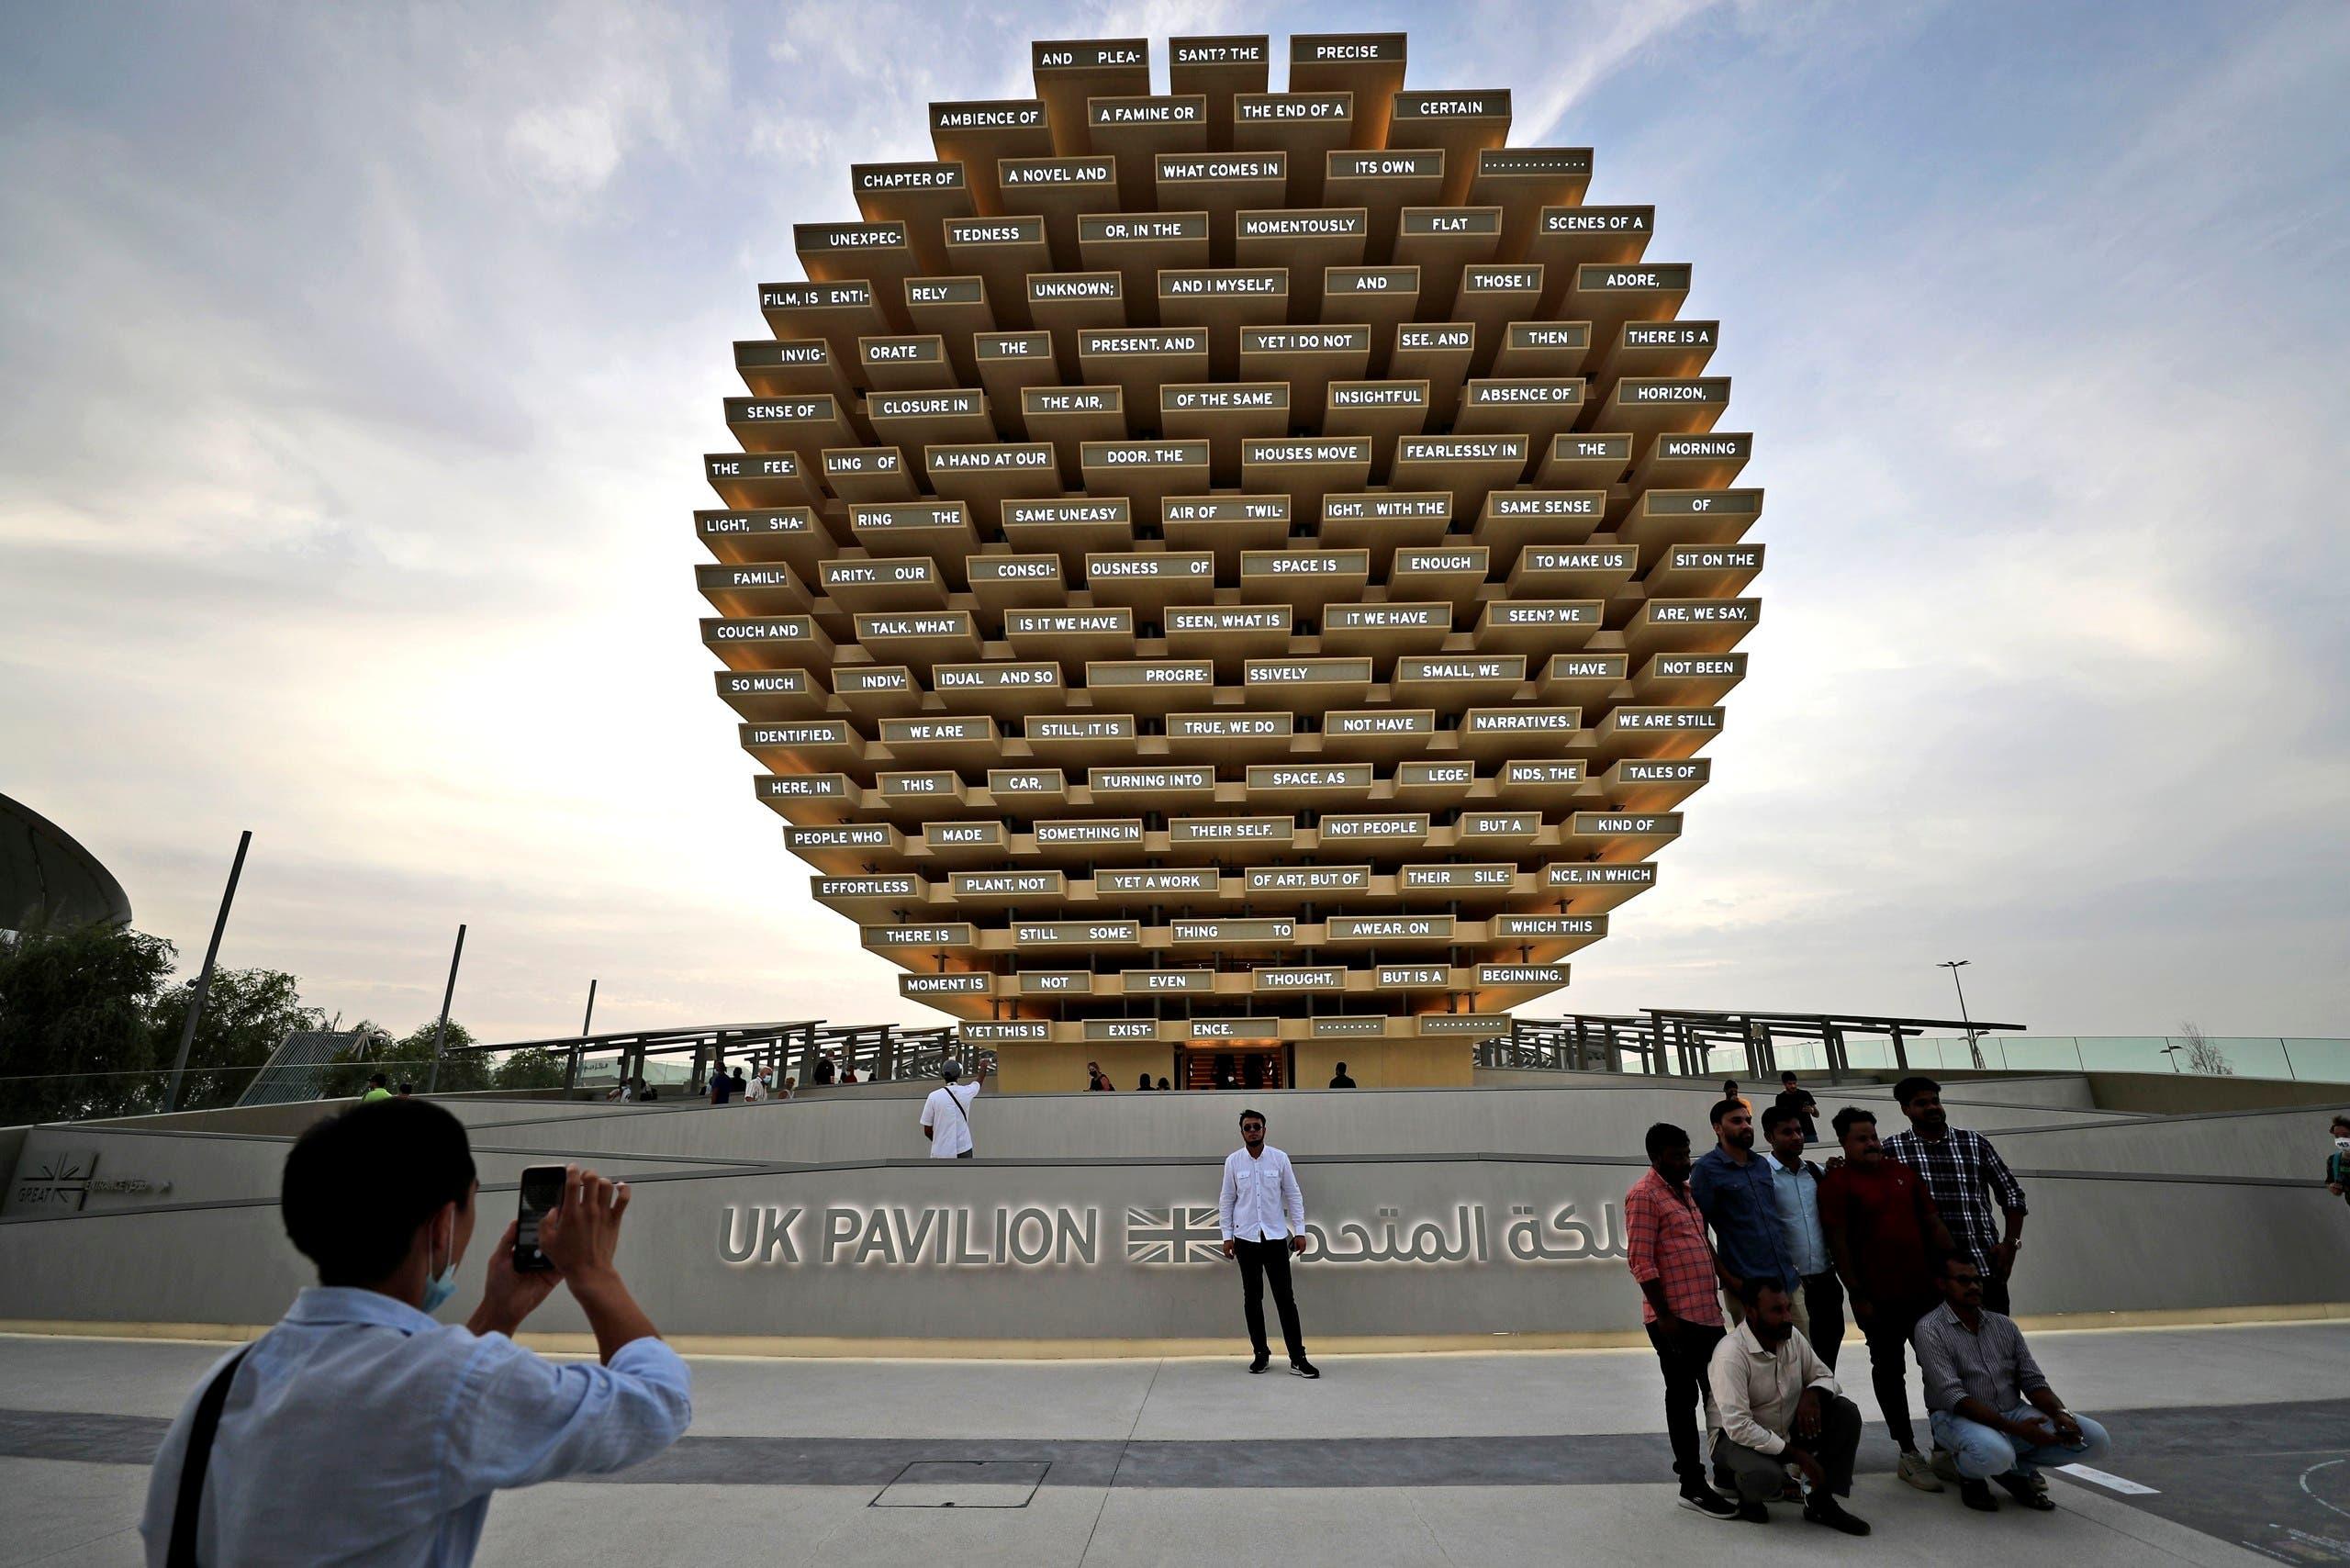 People visit the UK pavilion at the Dubai Expo 2020, in Dubai, United Arab Emirates, Sunday, Oct. 3, 2021. (File photo: AP)